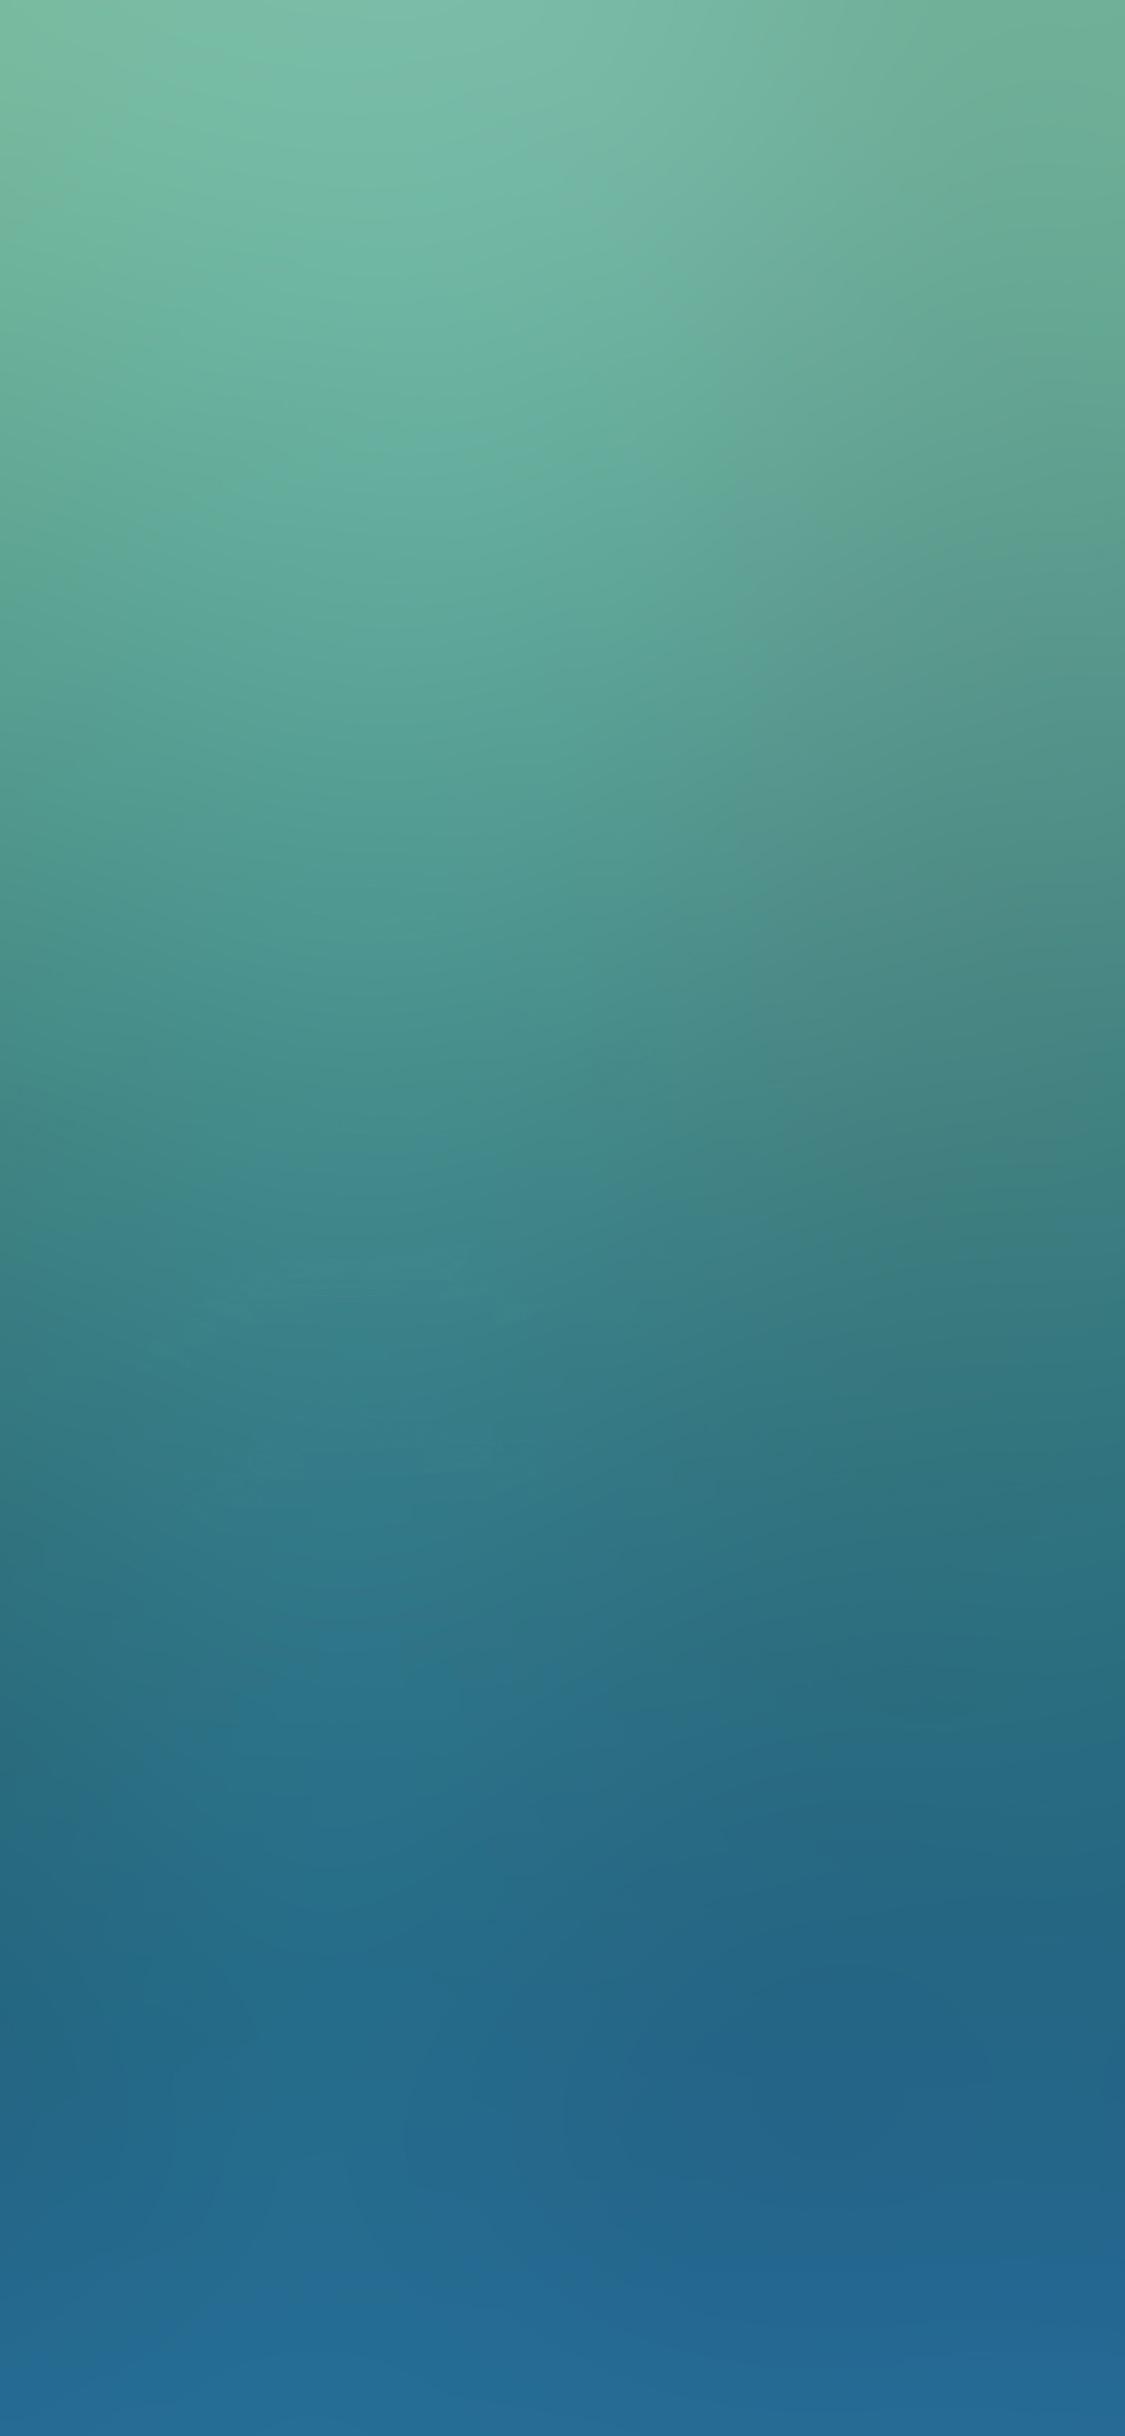 iPhoneXpapers.com-Apple-iPhone-wallpaper-sd47-aqua-deep-excited-gradation-blur